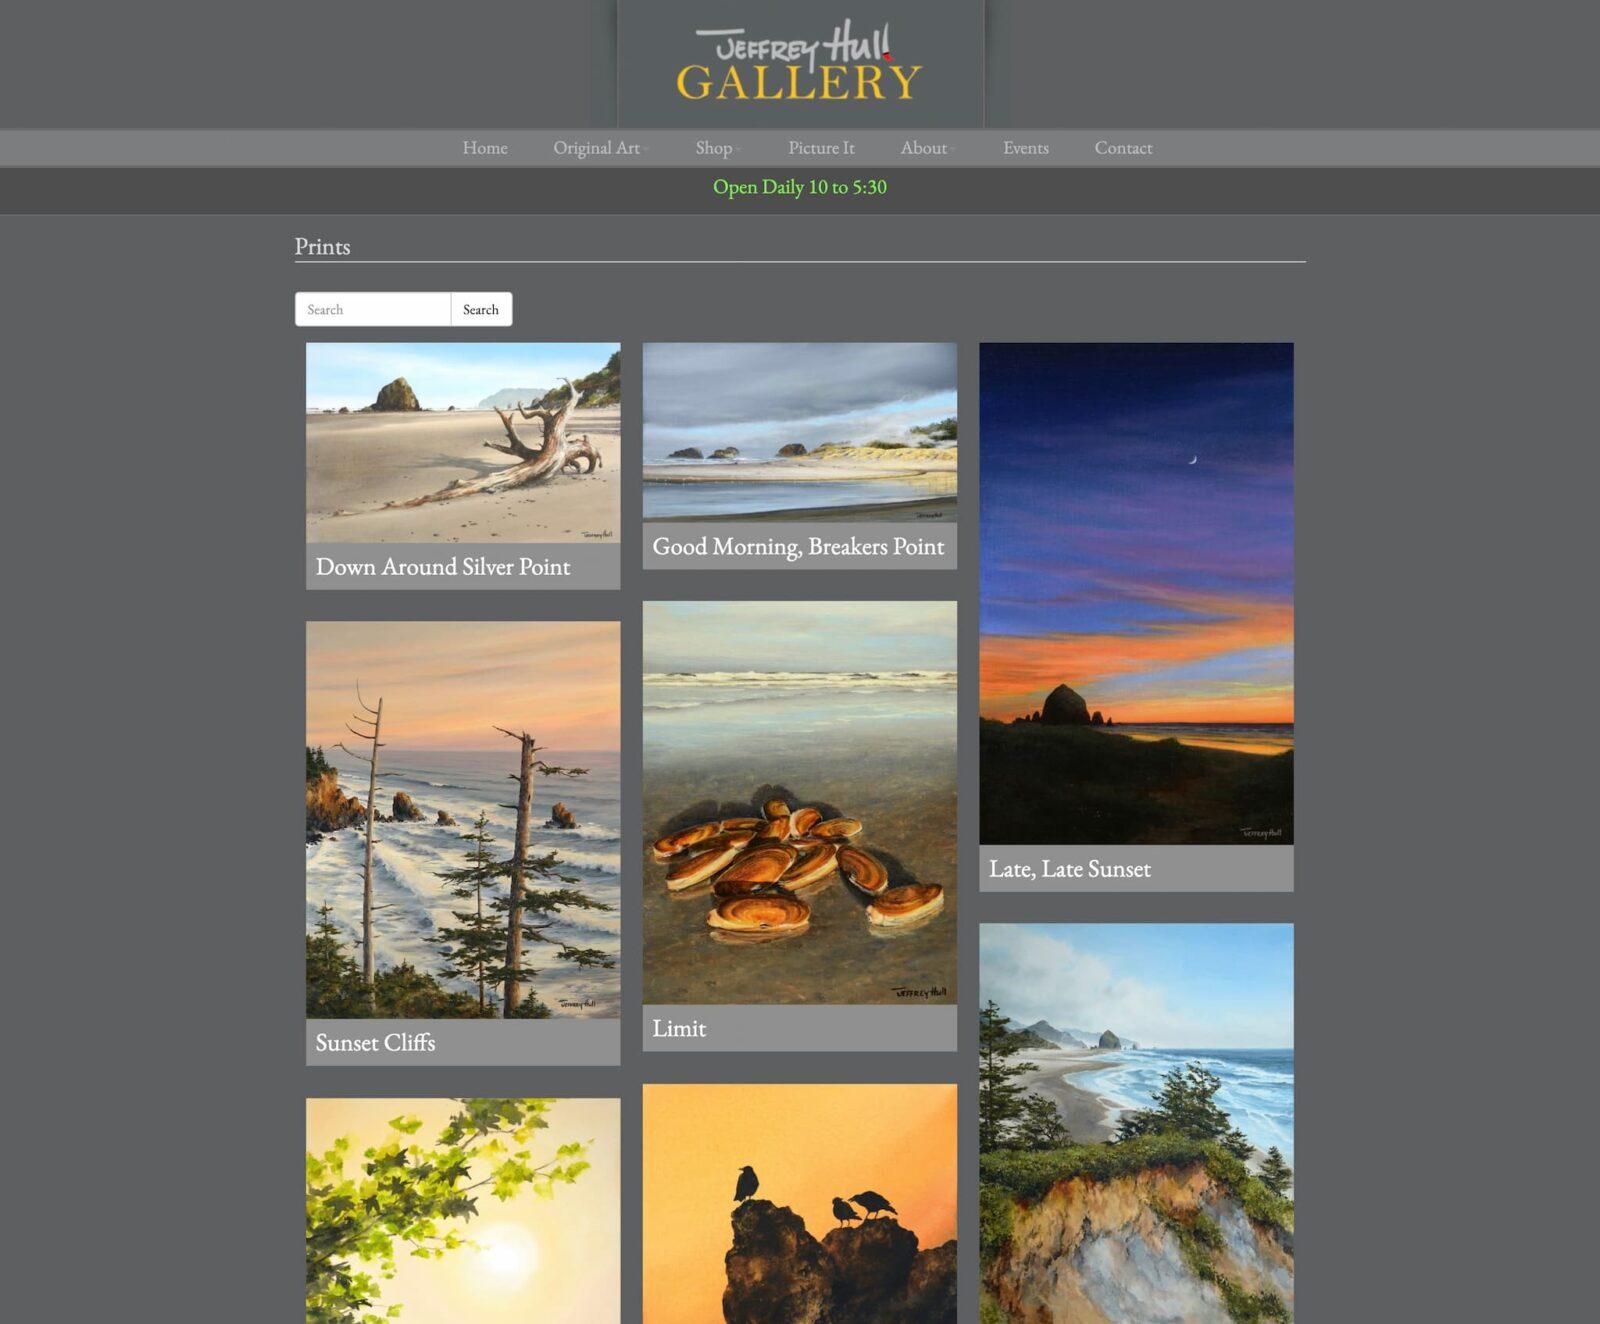 Jeffery Hull Gallery prints